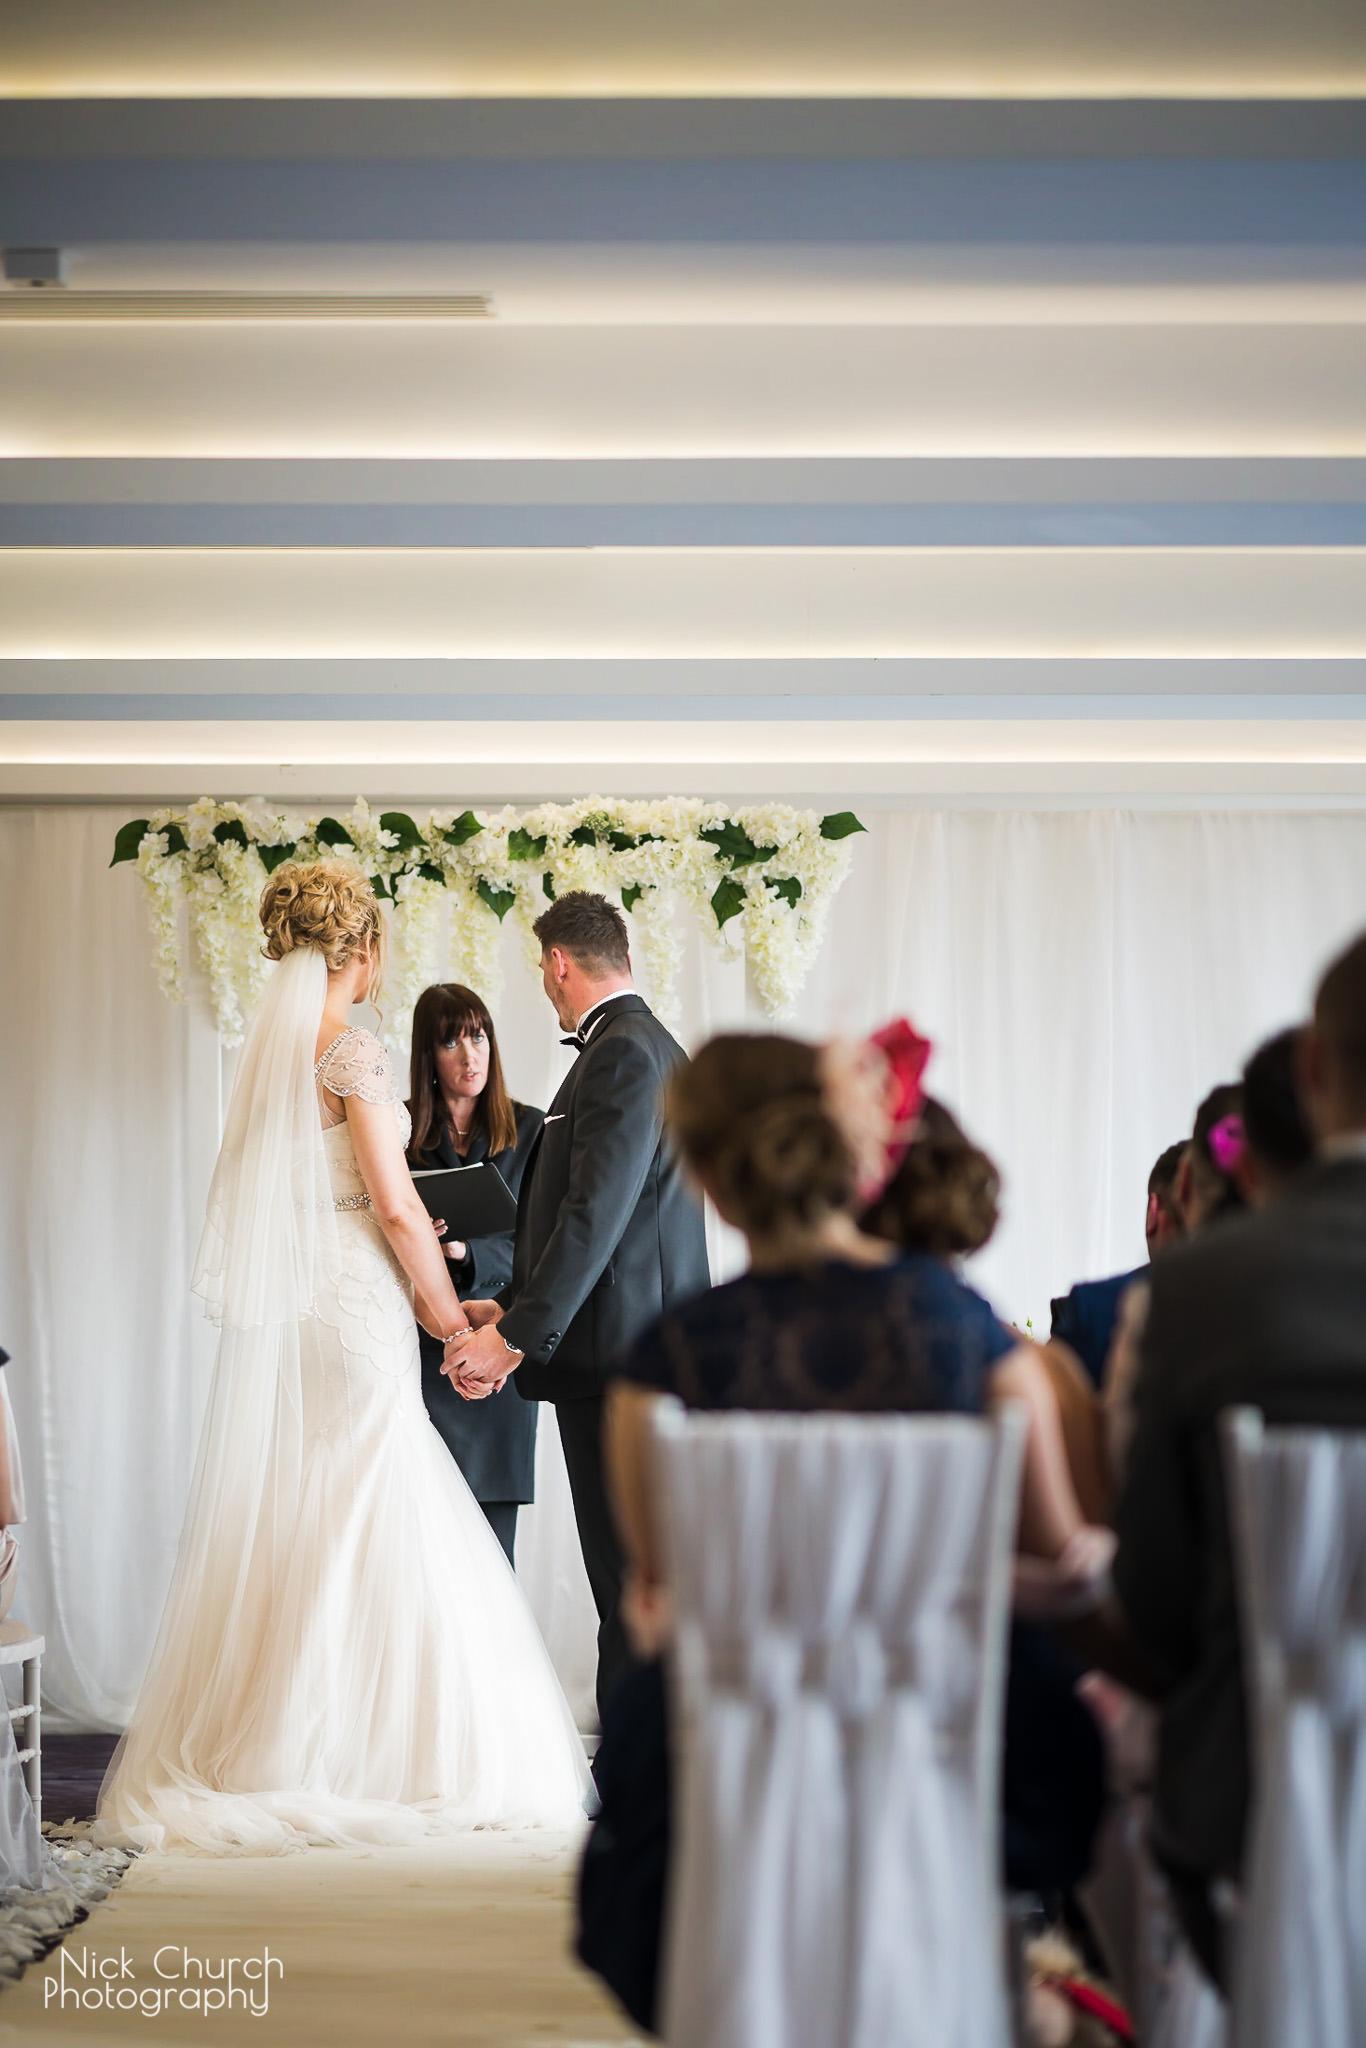 NC-20180317-stacy-and-mike-wedding-0469.jpg